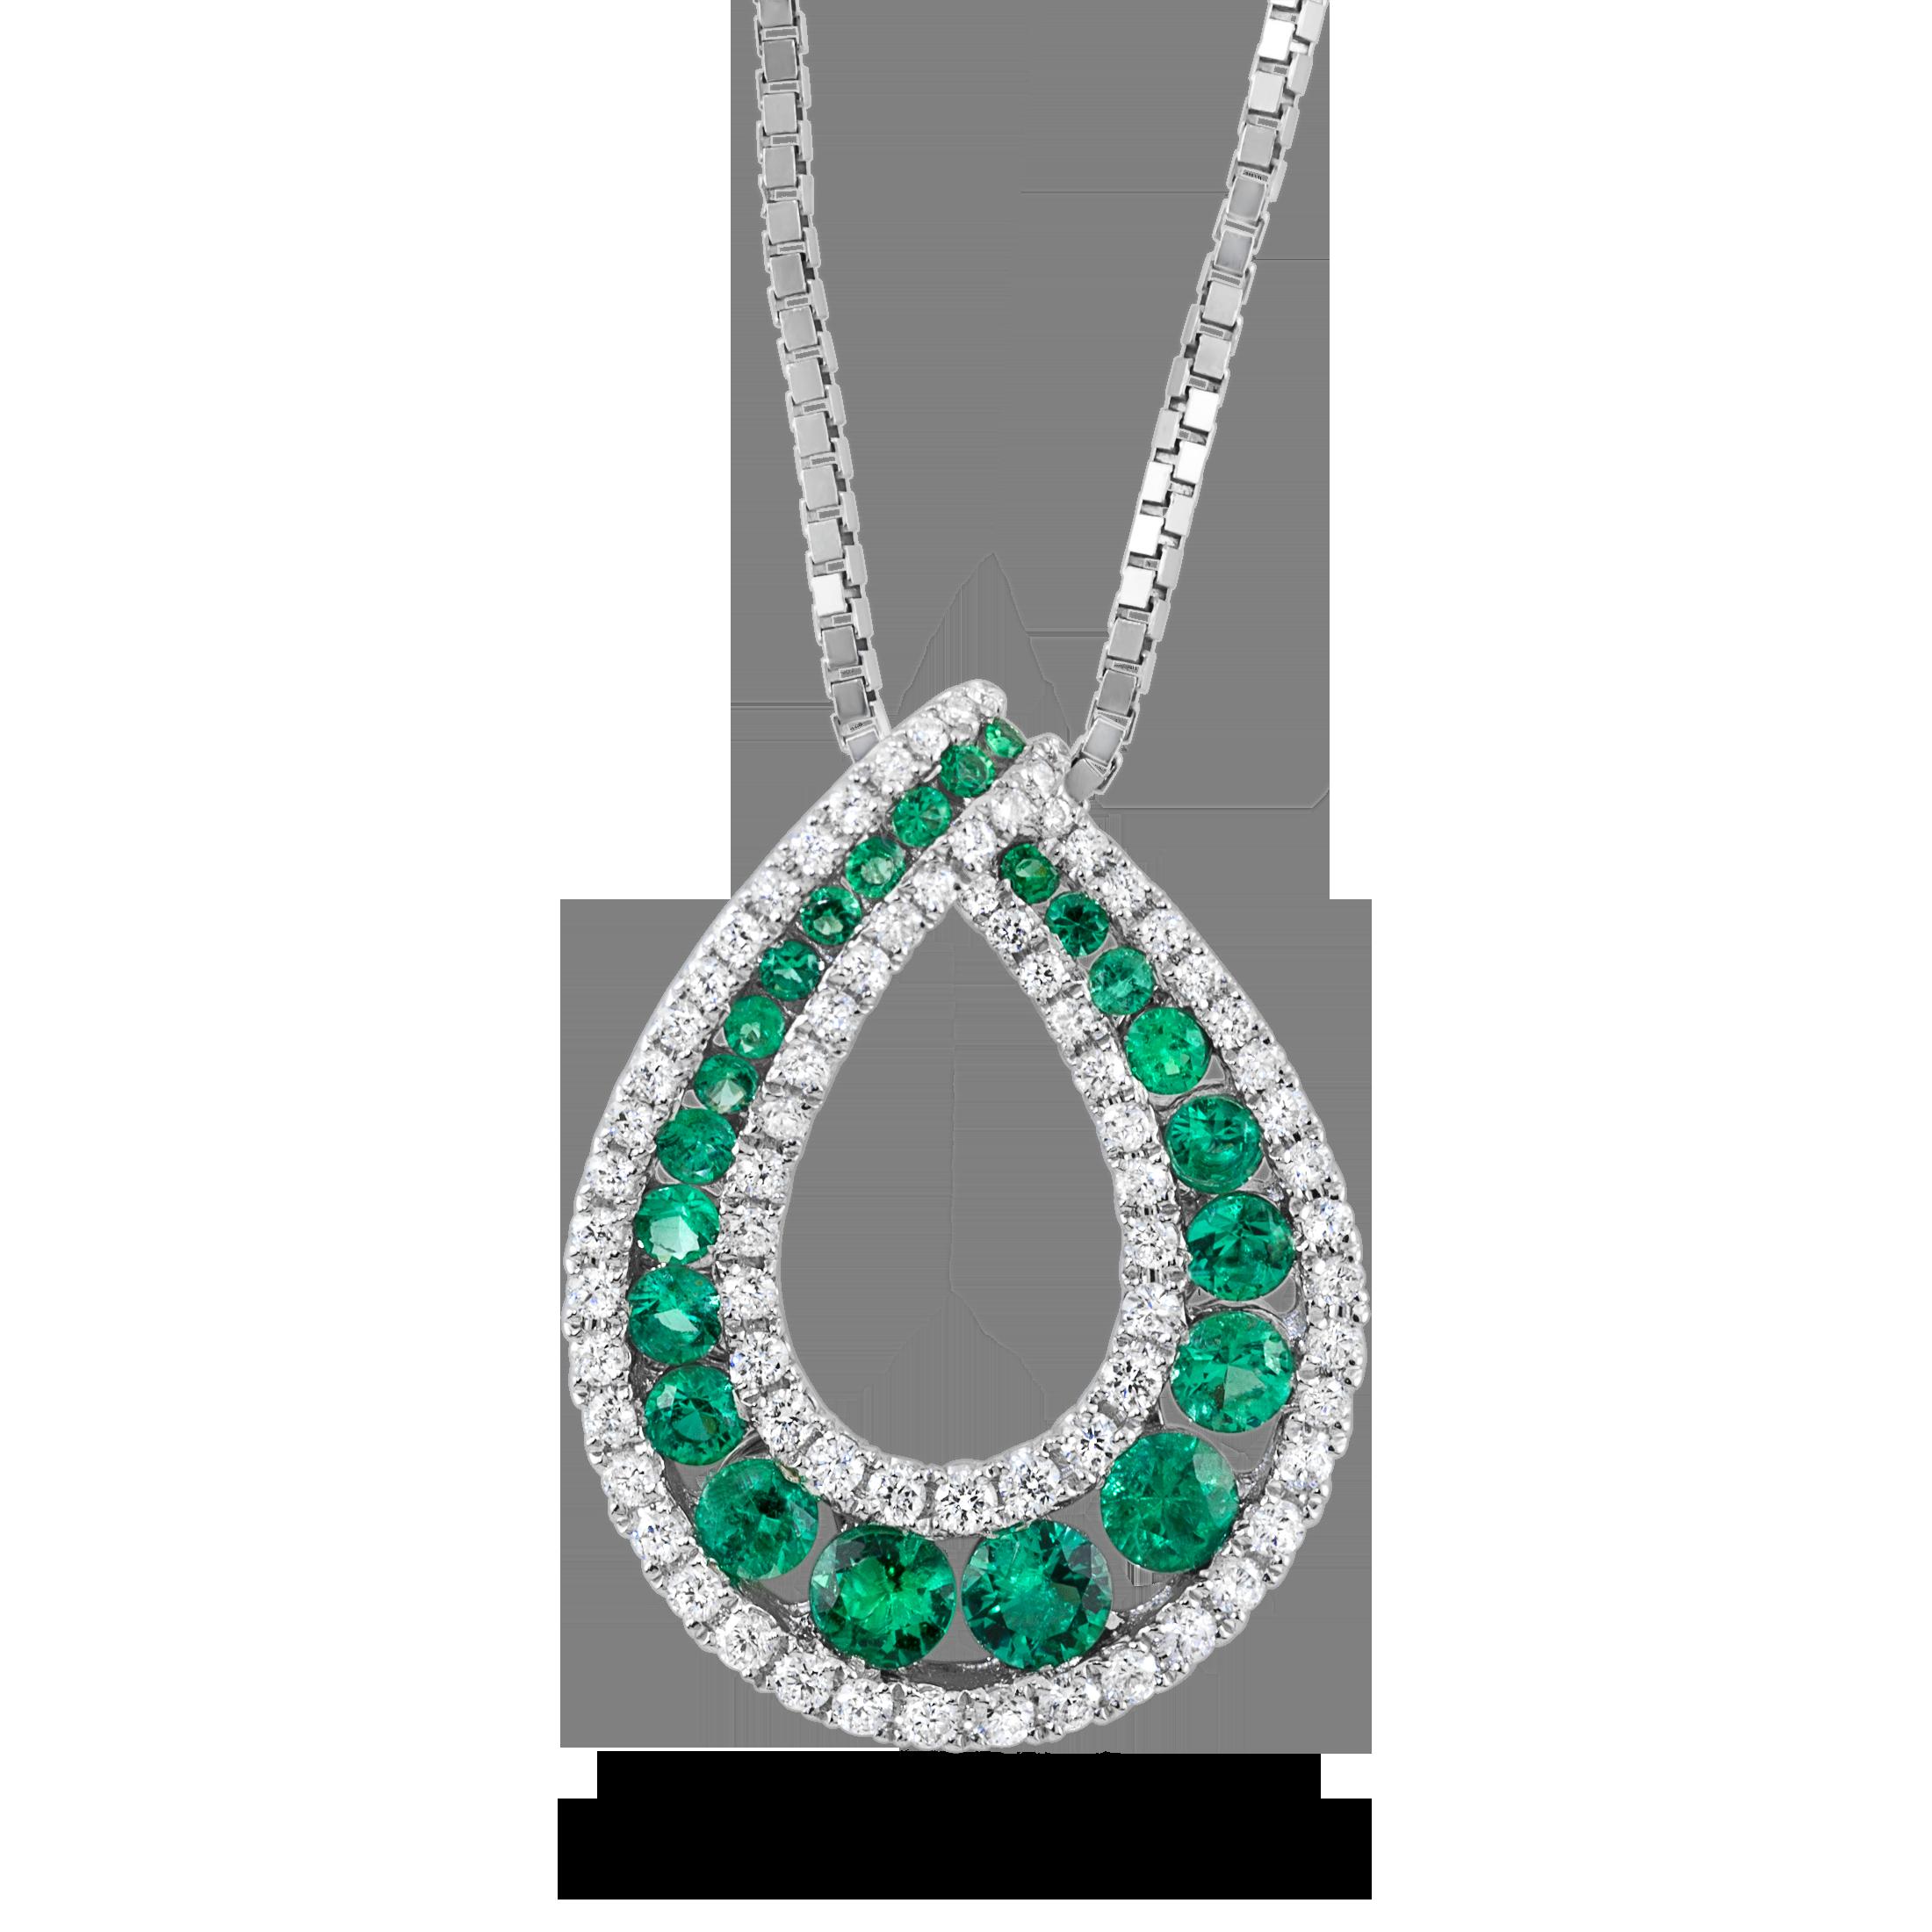 Diamond Pendant Png Image Jewelry Jewelry Catalog Jewelry Online Shopping